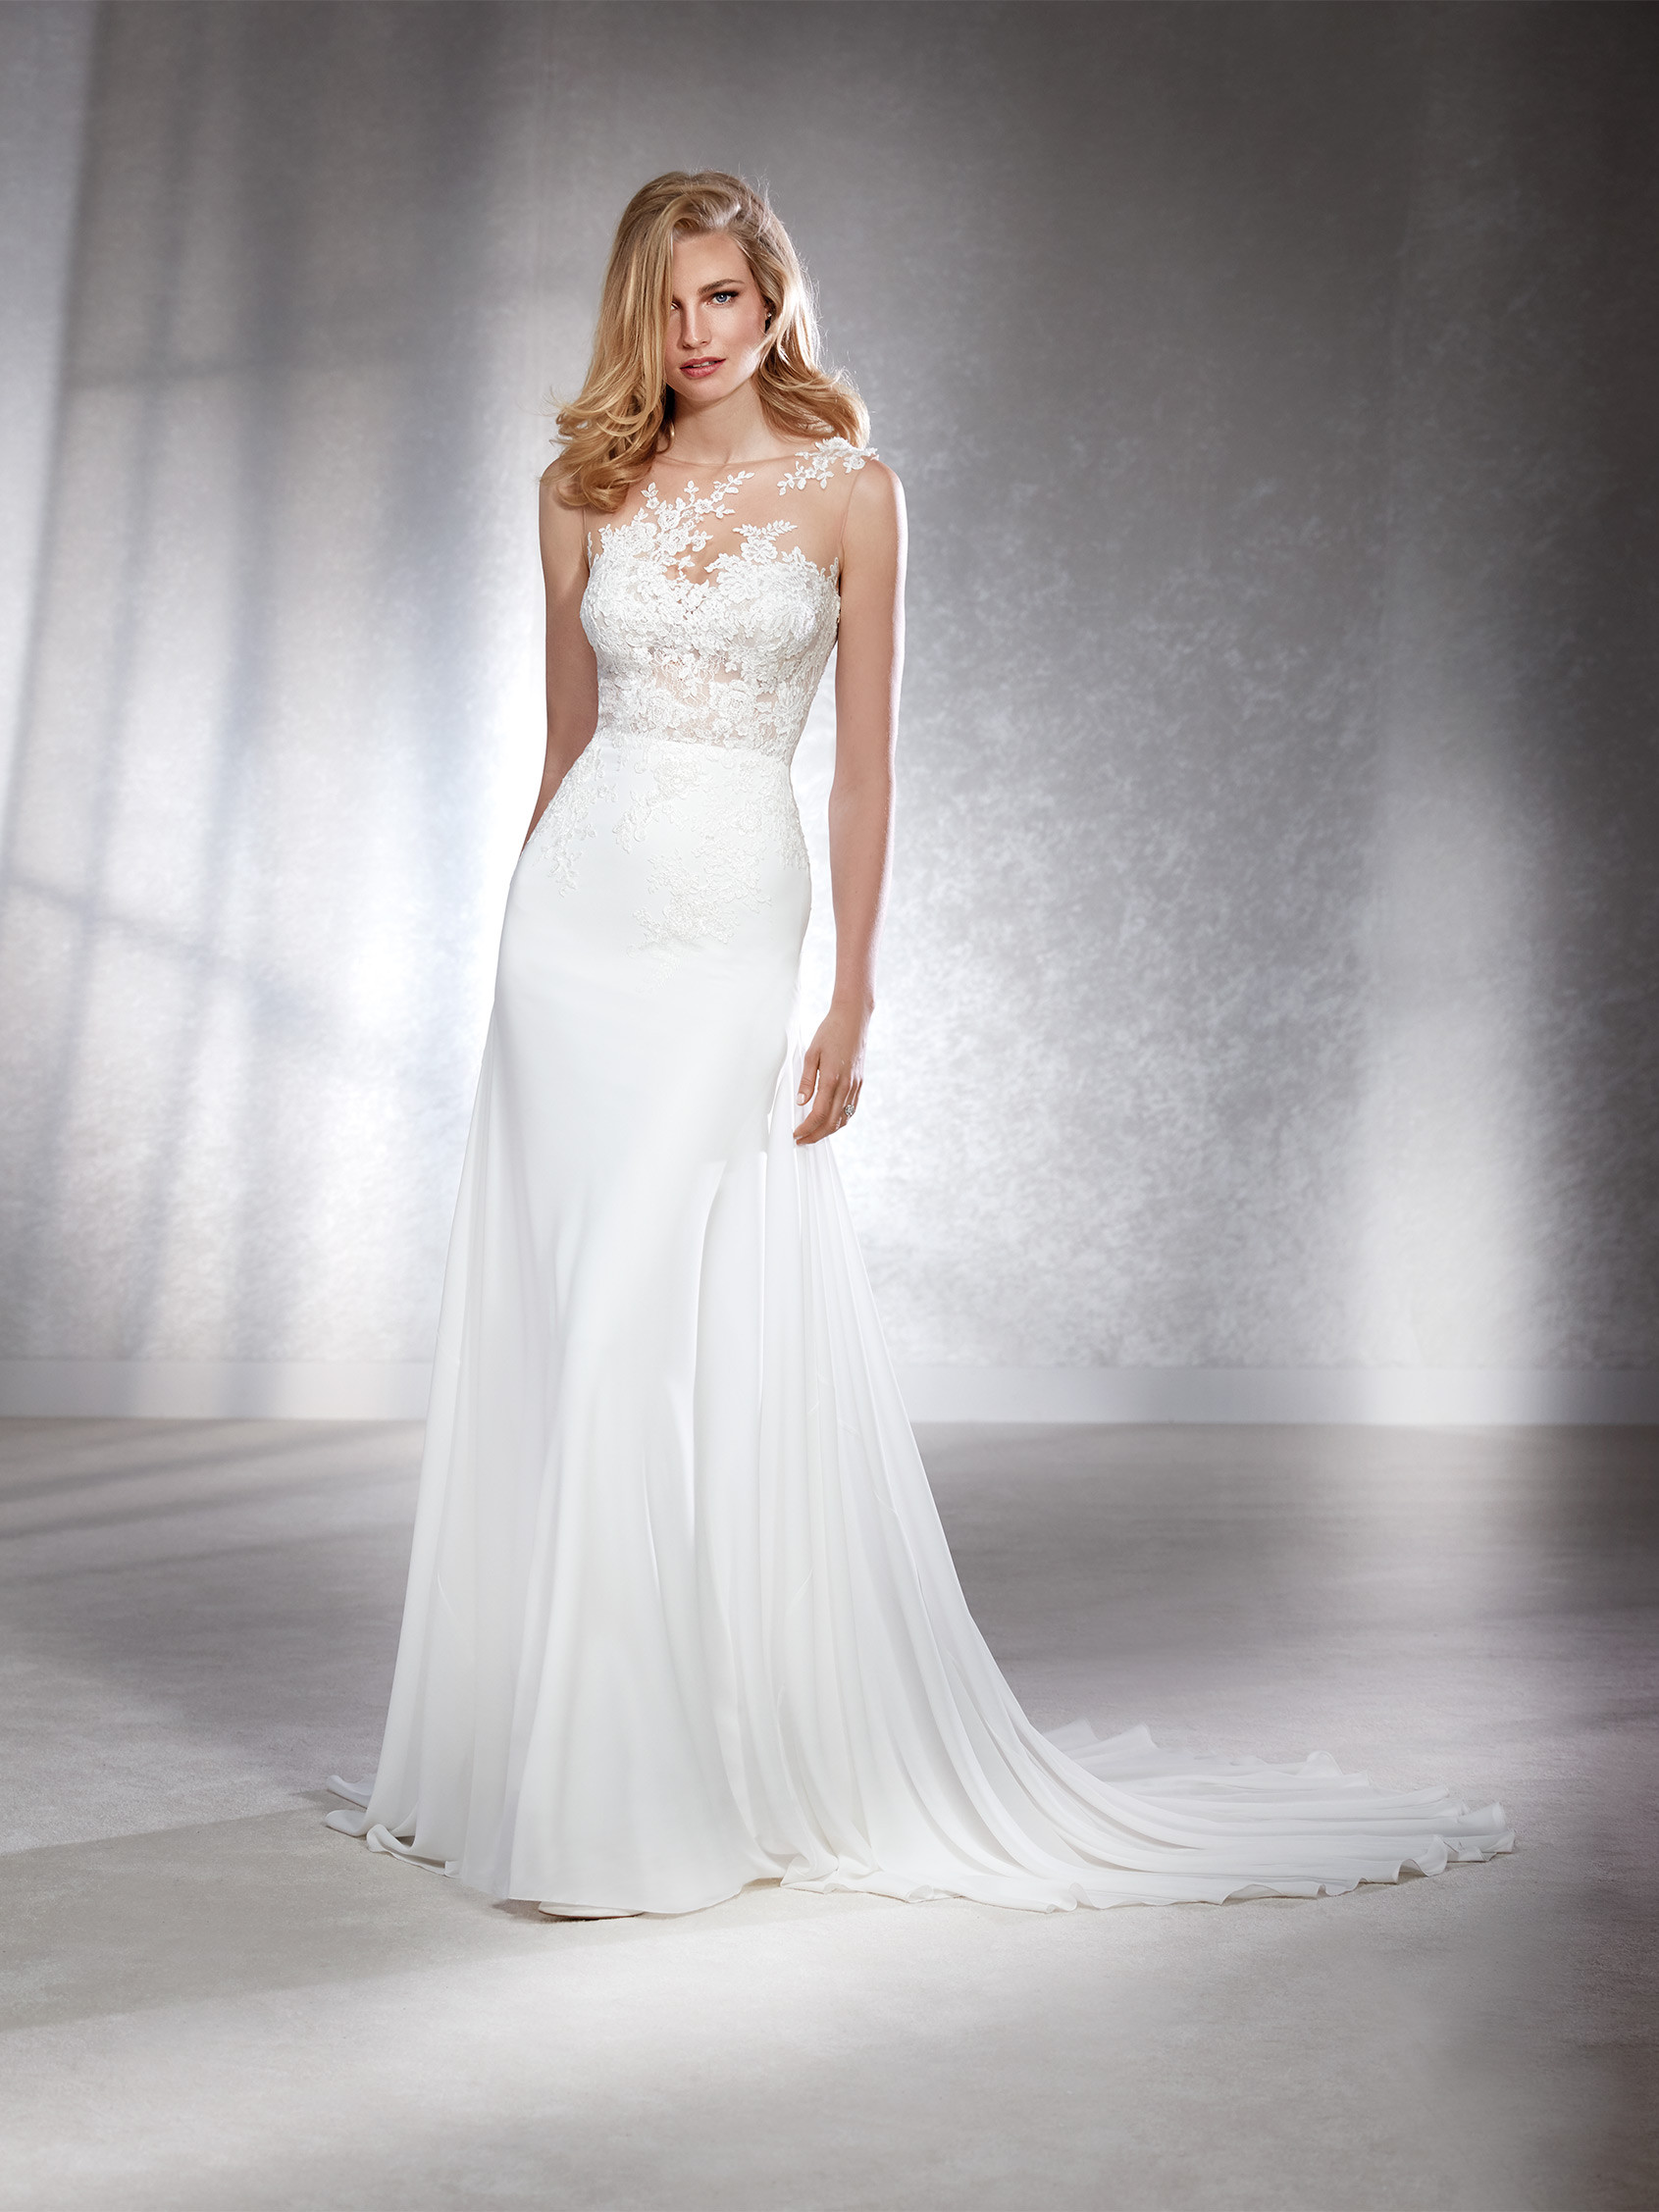 Plus Size Bridal Shop Kansas City